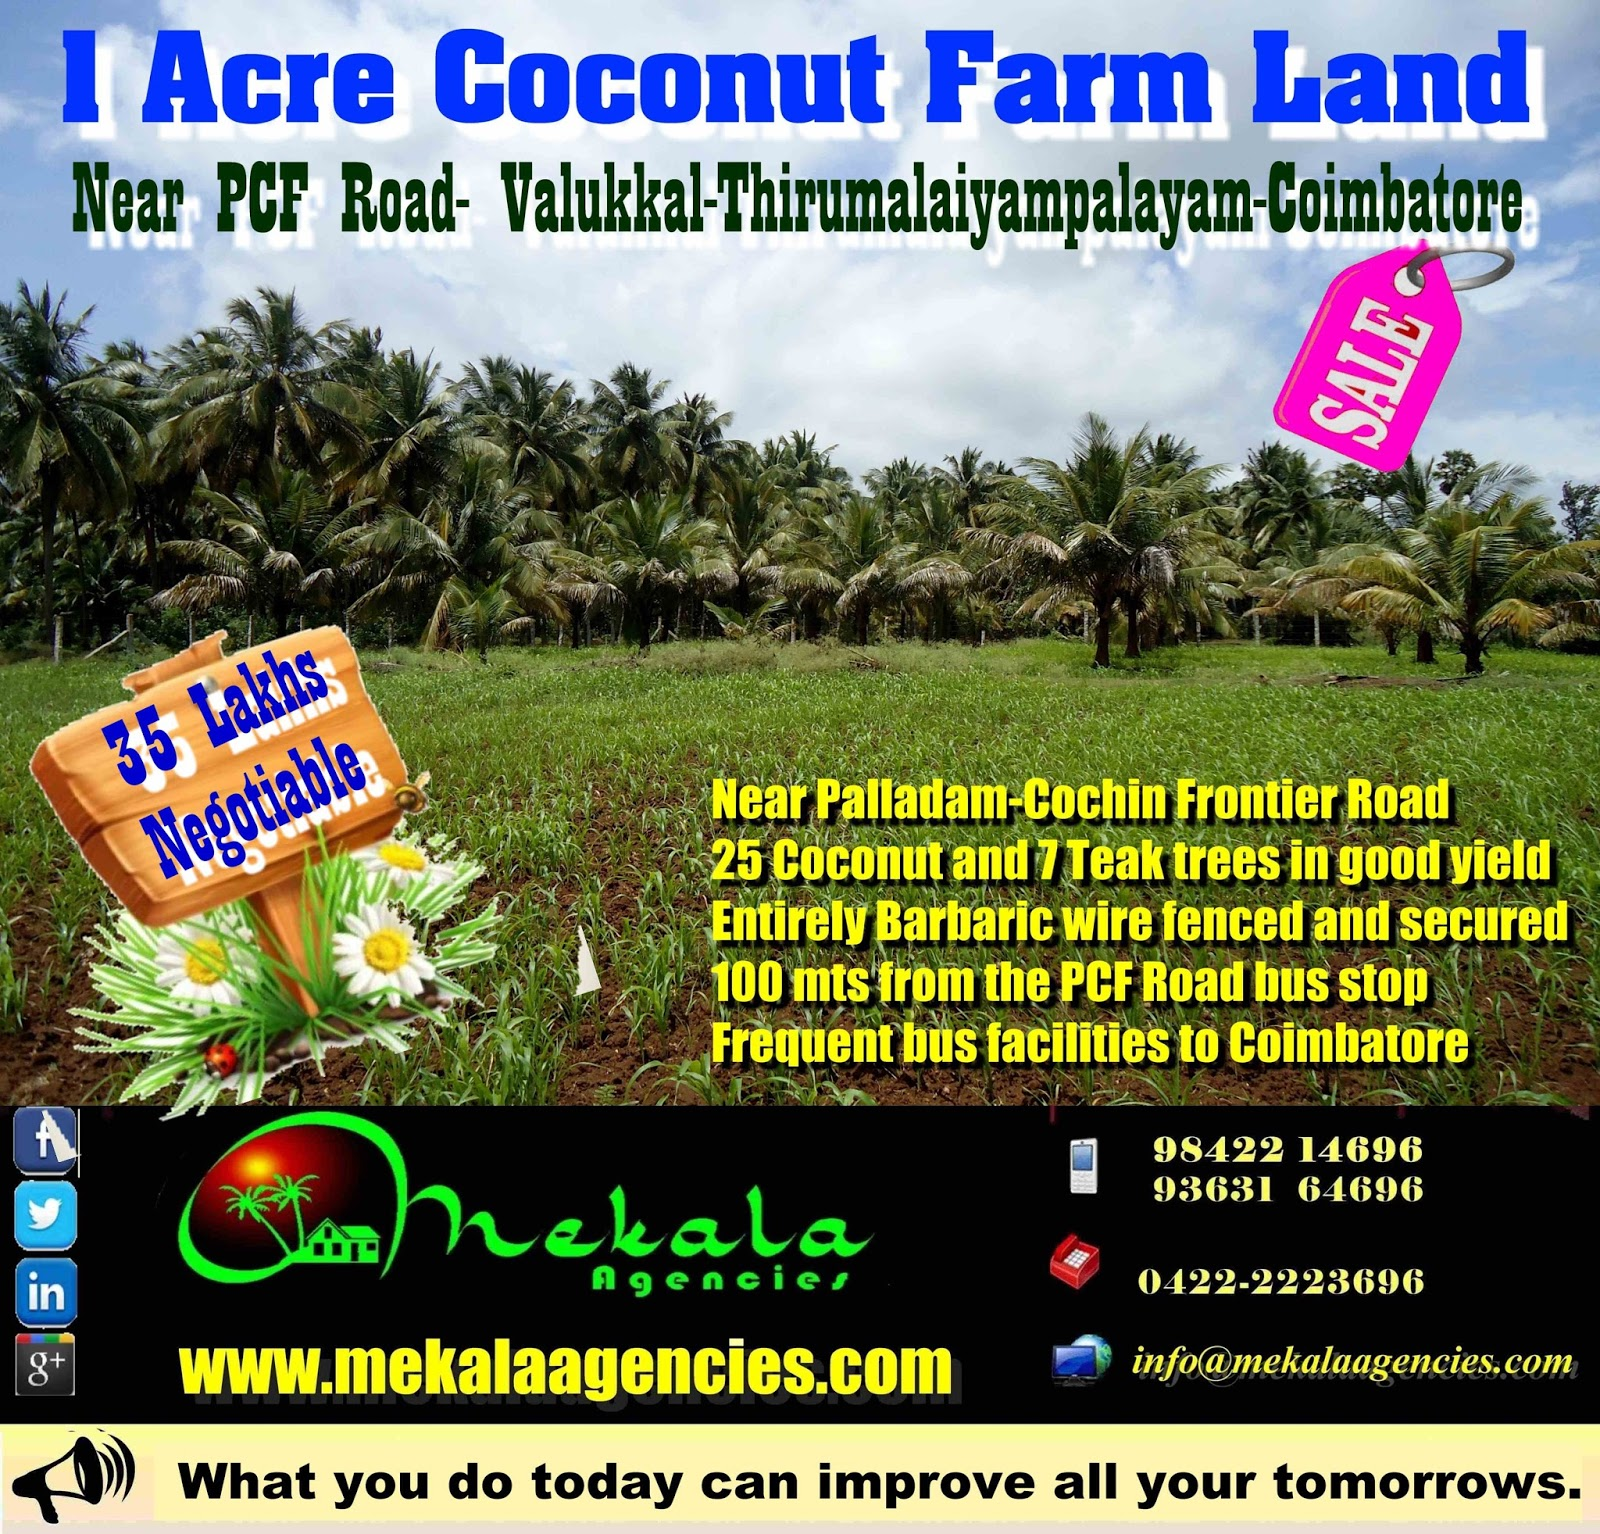 1 Acre Coconut farm land Sale near PCF Road-Valukkal